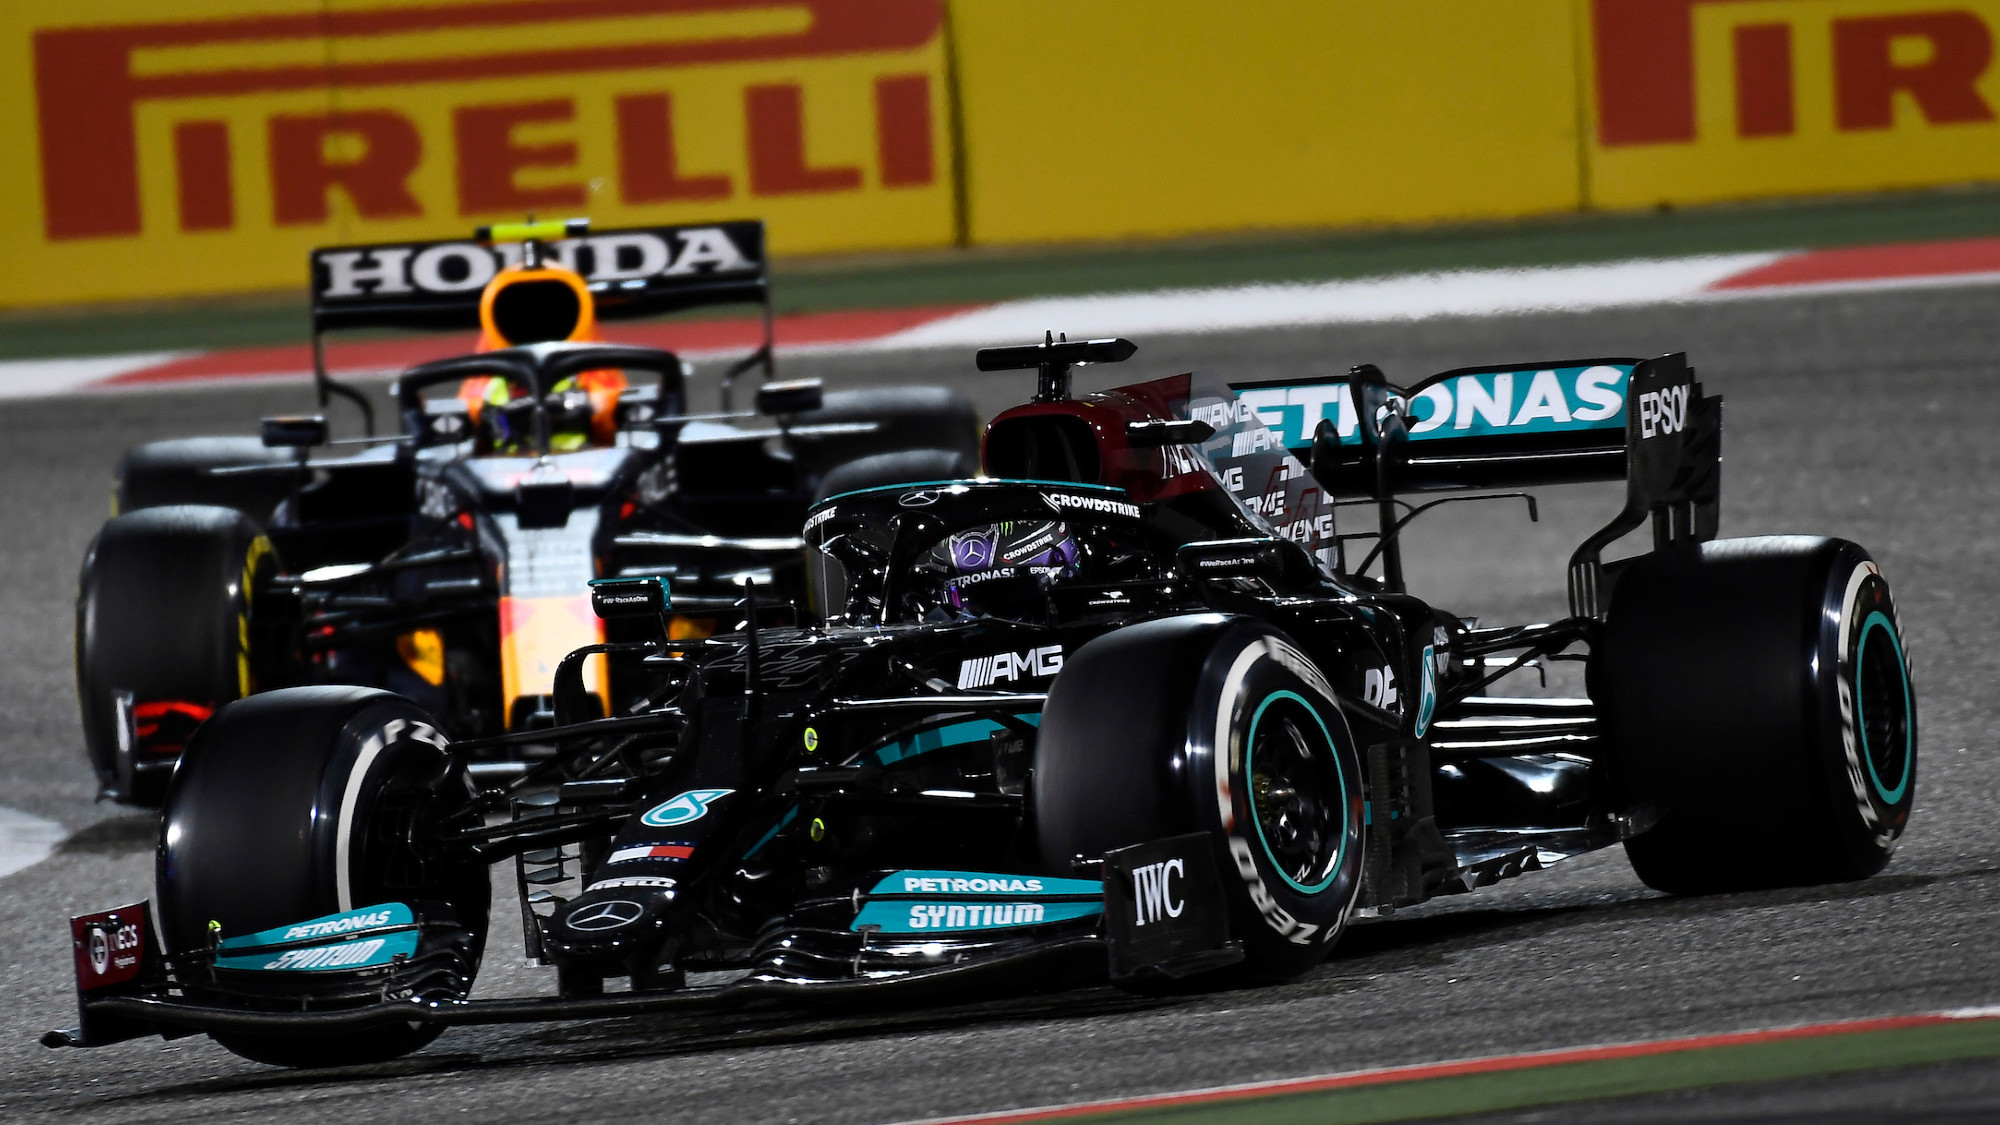 Lewis Hamilton, 2021 Bahrain GP